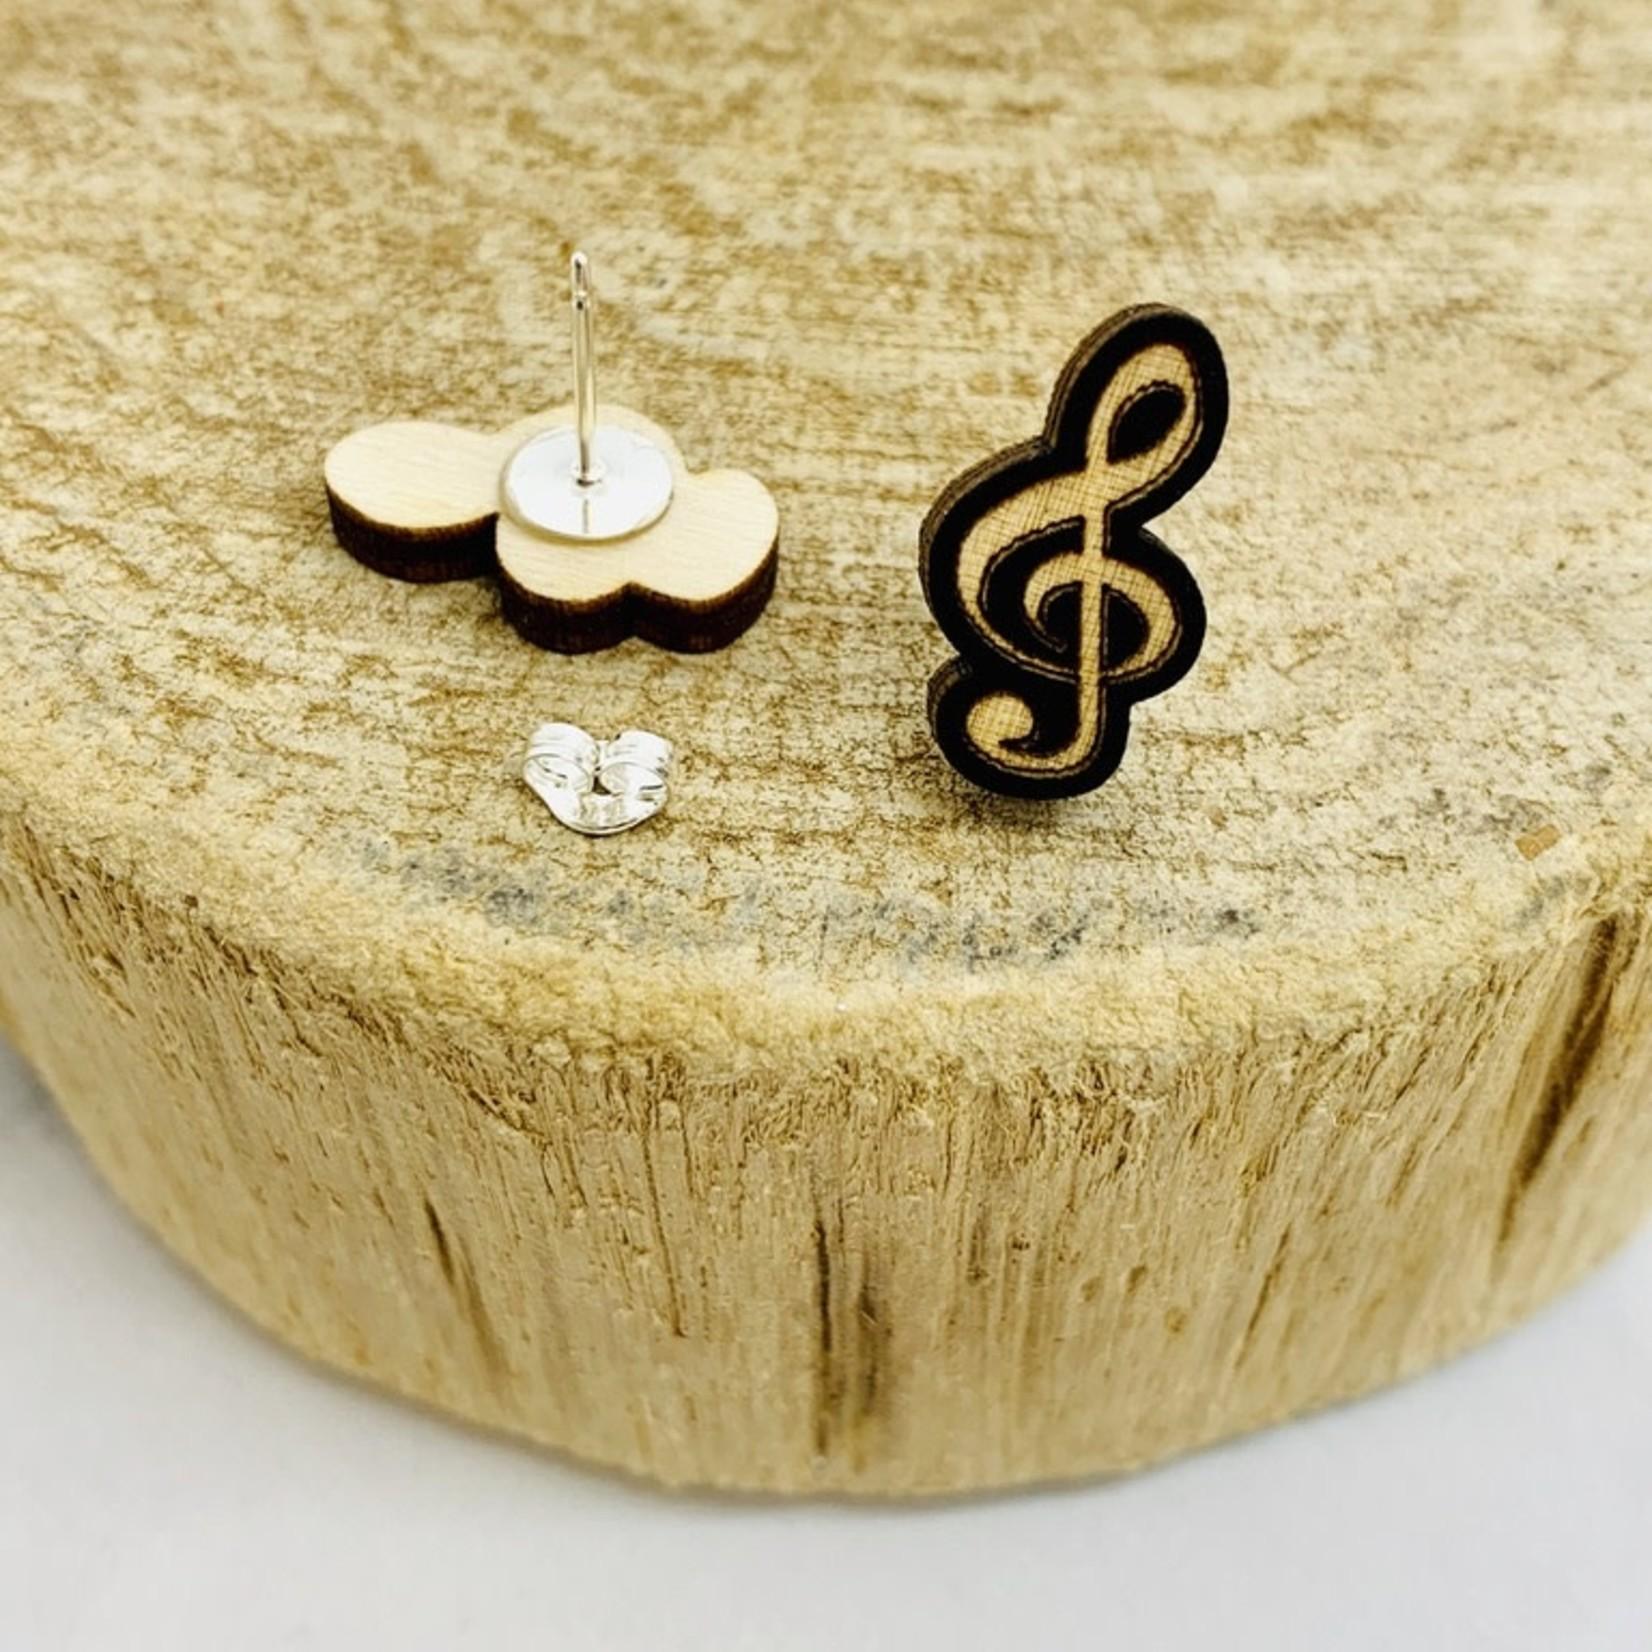 Handmade Treble Clef Lasercut Wood Earrings on Sterling Silver Posts